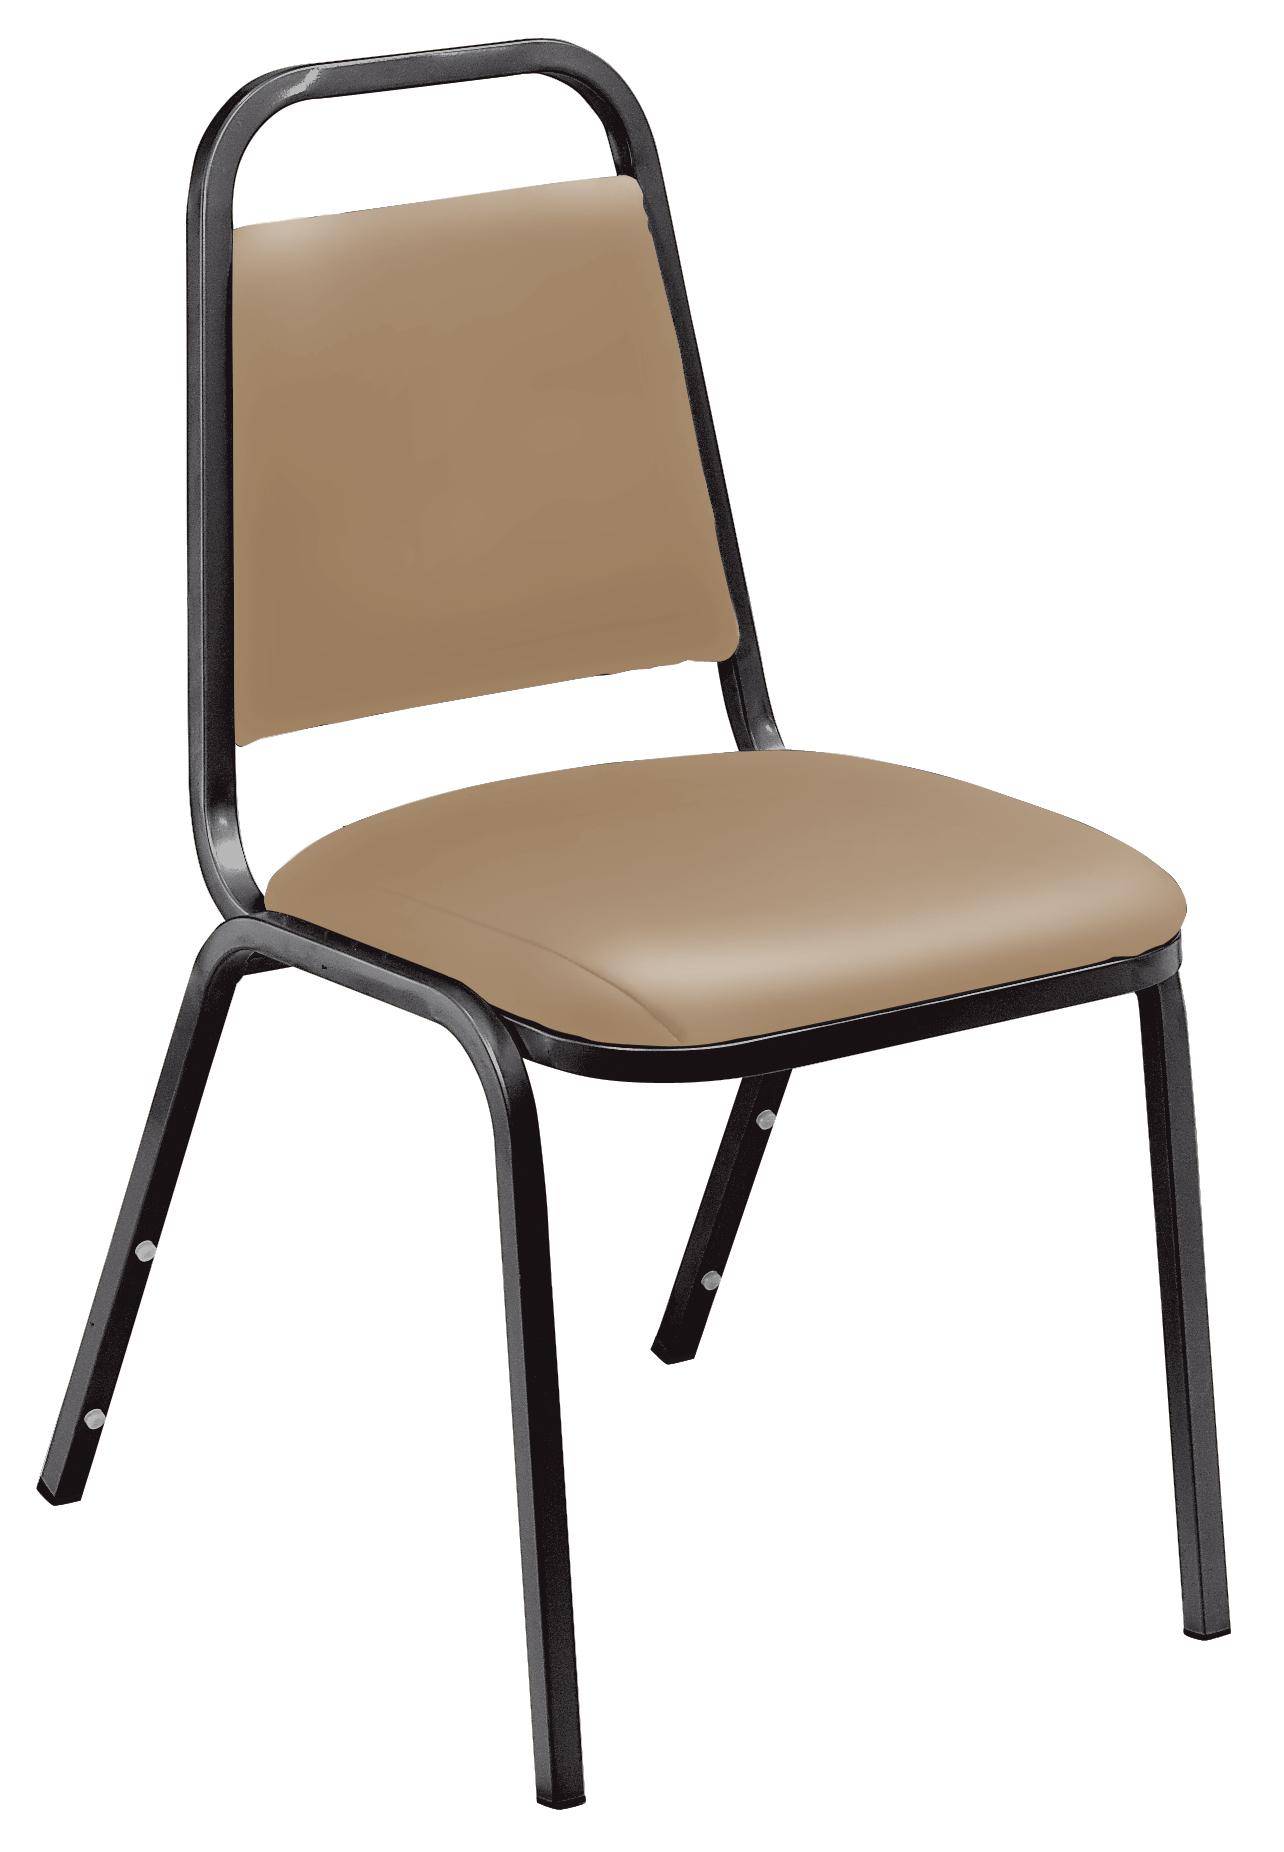 public seating chairs pvc adirondack 4 national 9100v economy vinyl upholstered